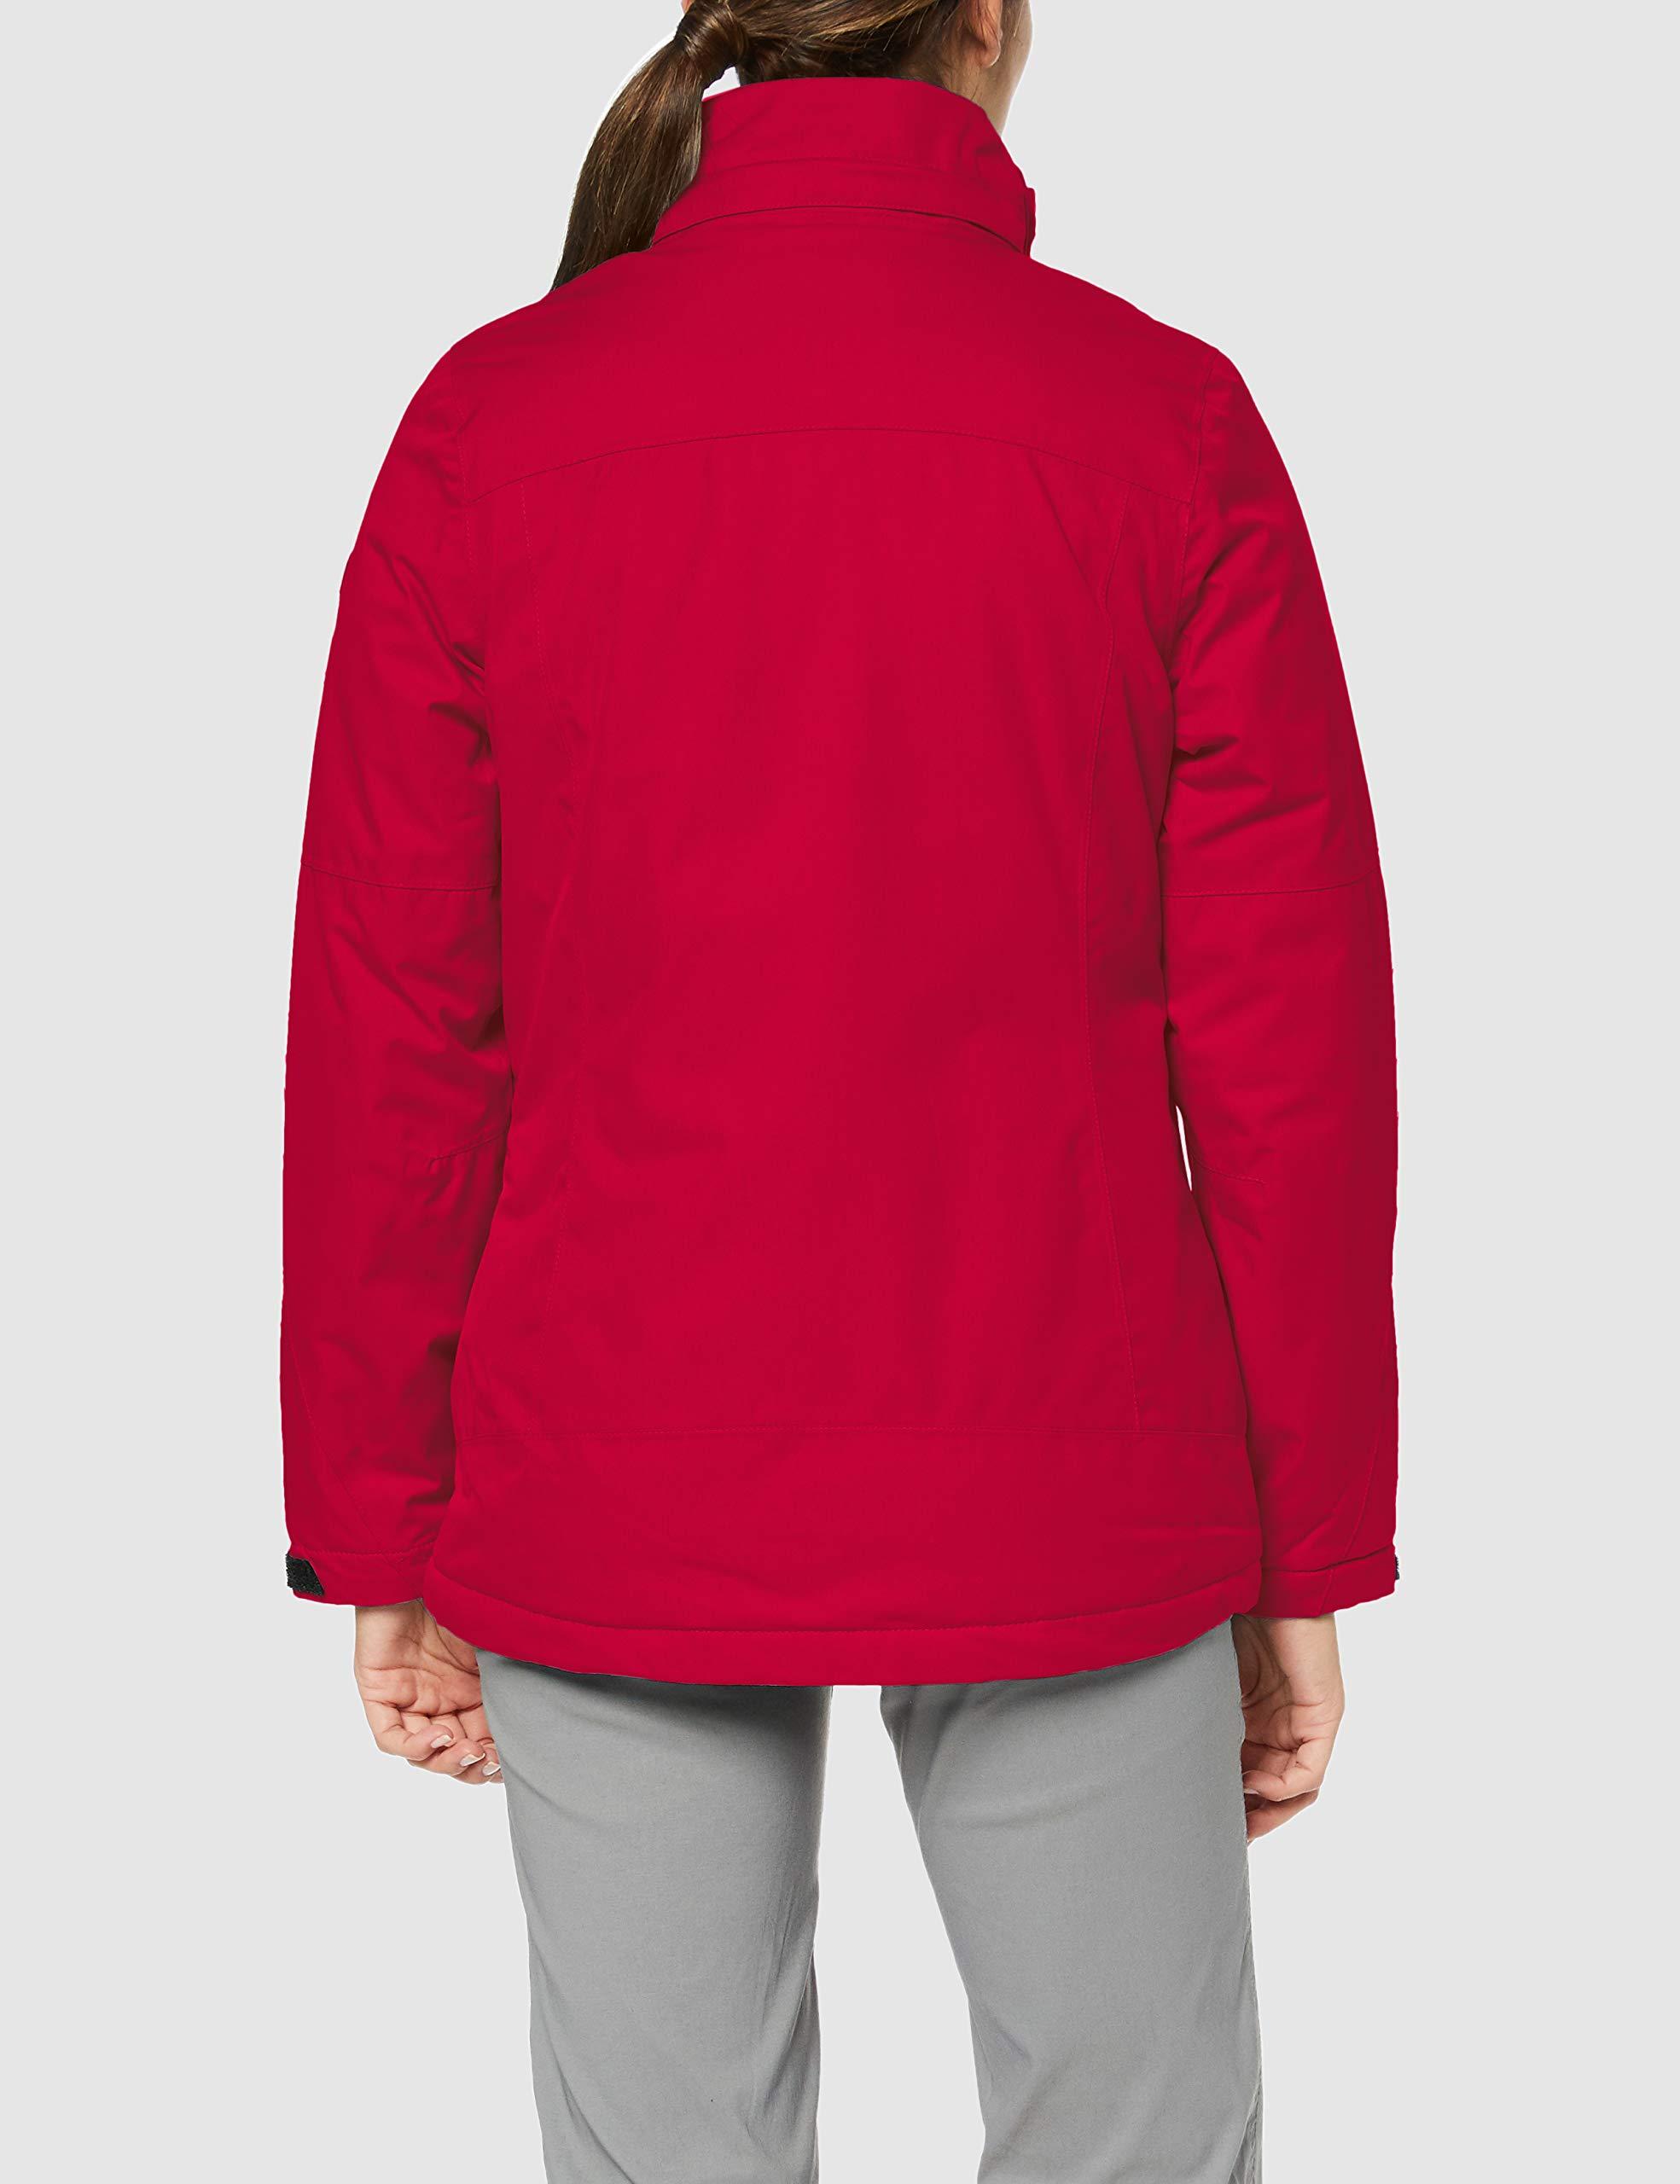 71T3Wh5KjBL - killtec Women's Zala Functional Jacket with Zip-Off Hood